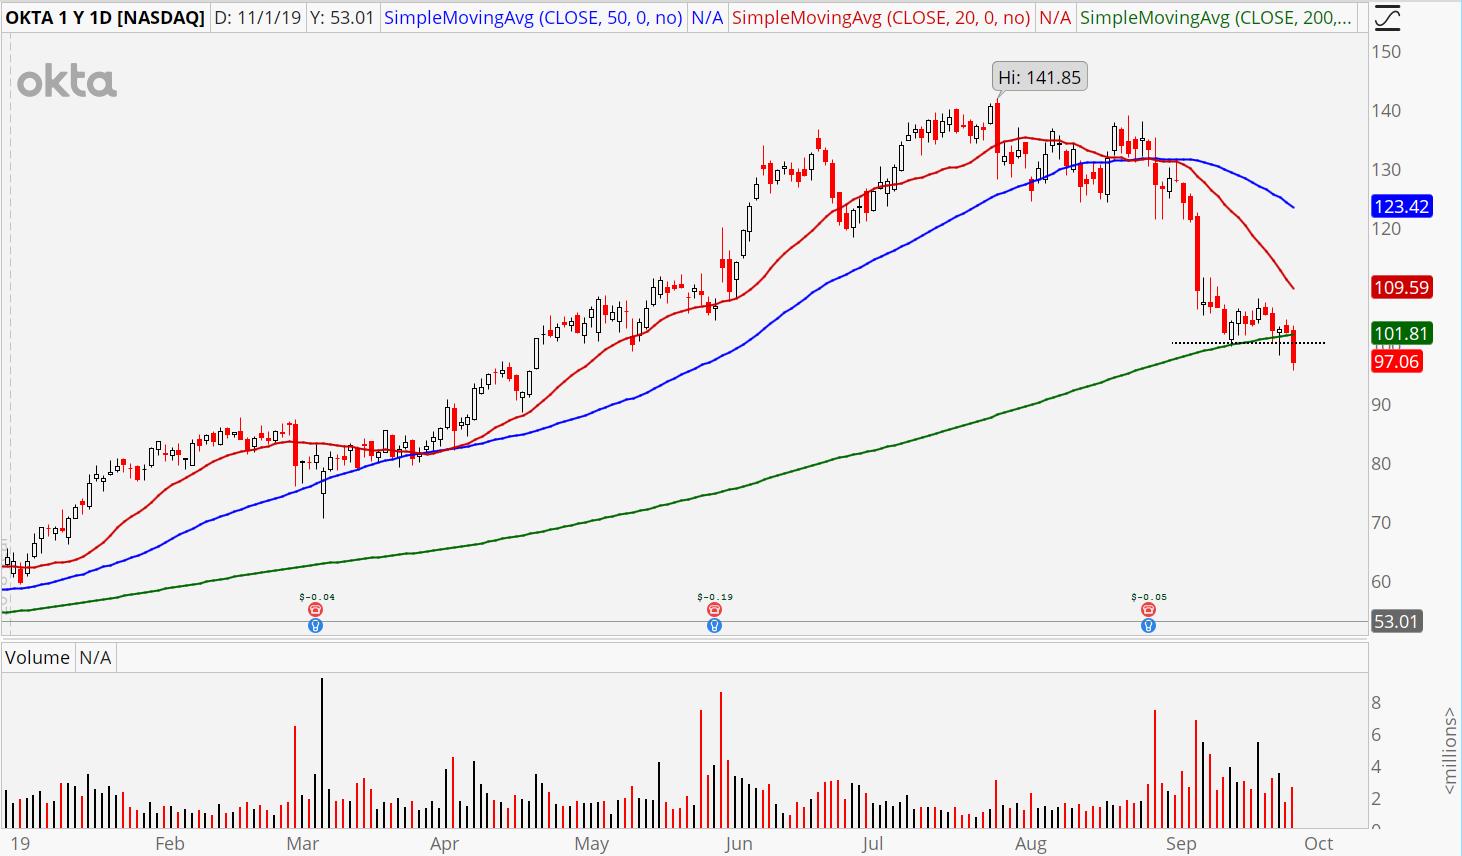 3 Software Stocks to Sell: Okta (OKTA)